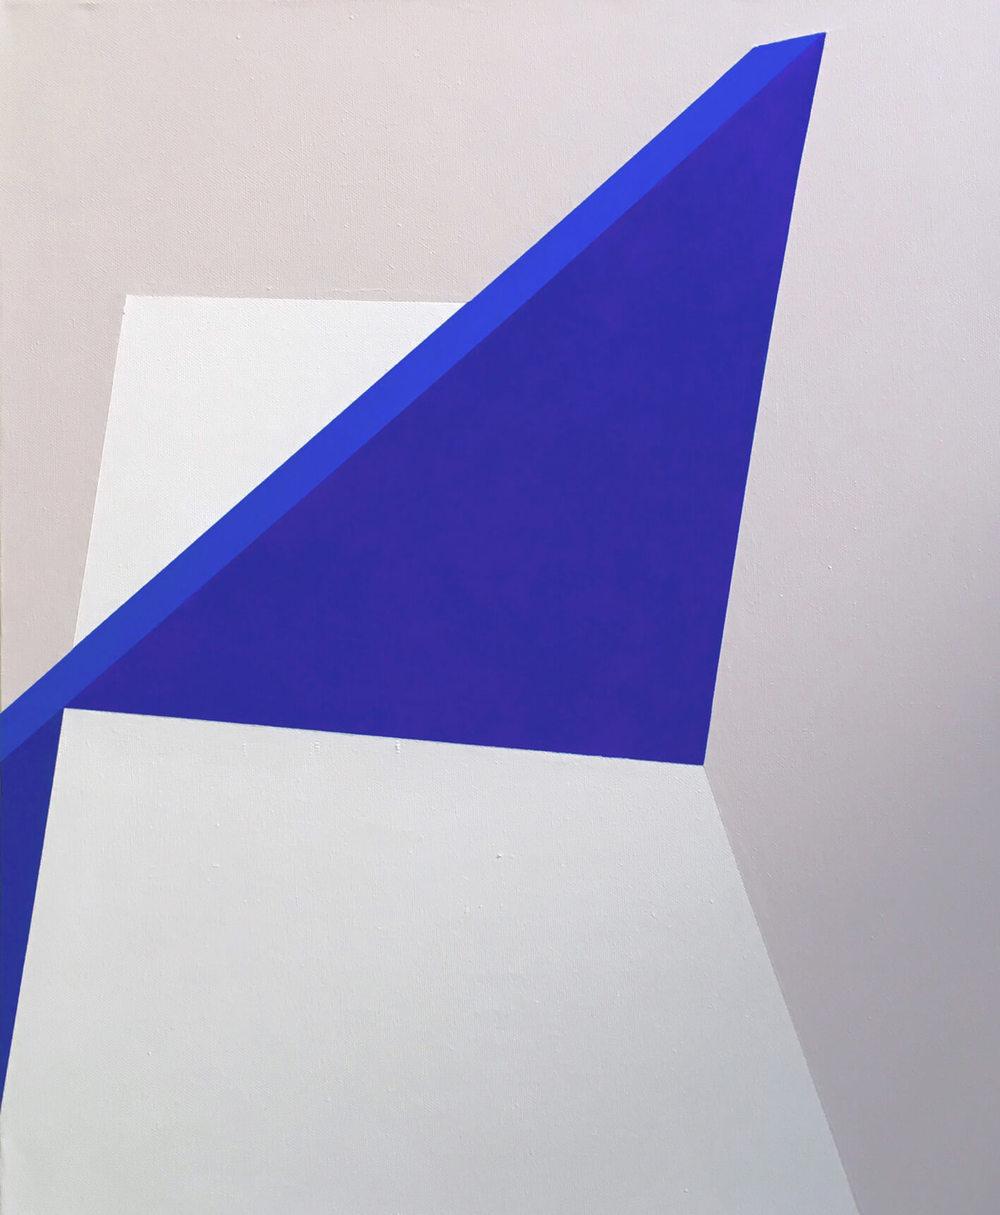 Minimal 14, 60 cm x 50 x 4 cm, Acryl auf Leinwand, © Ute Latzke, 2016, Preis: 300 Euro.